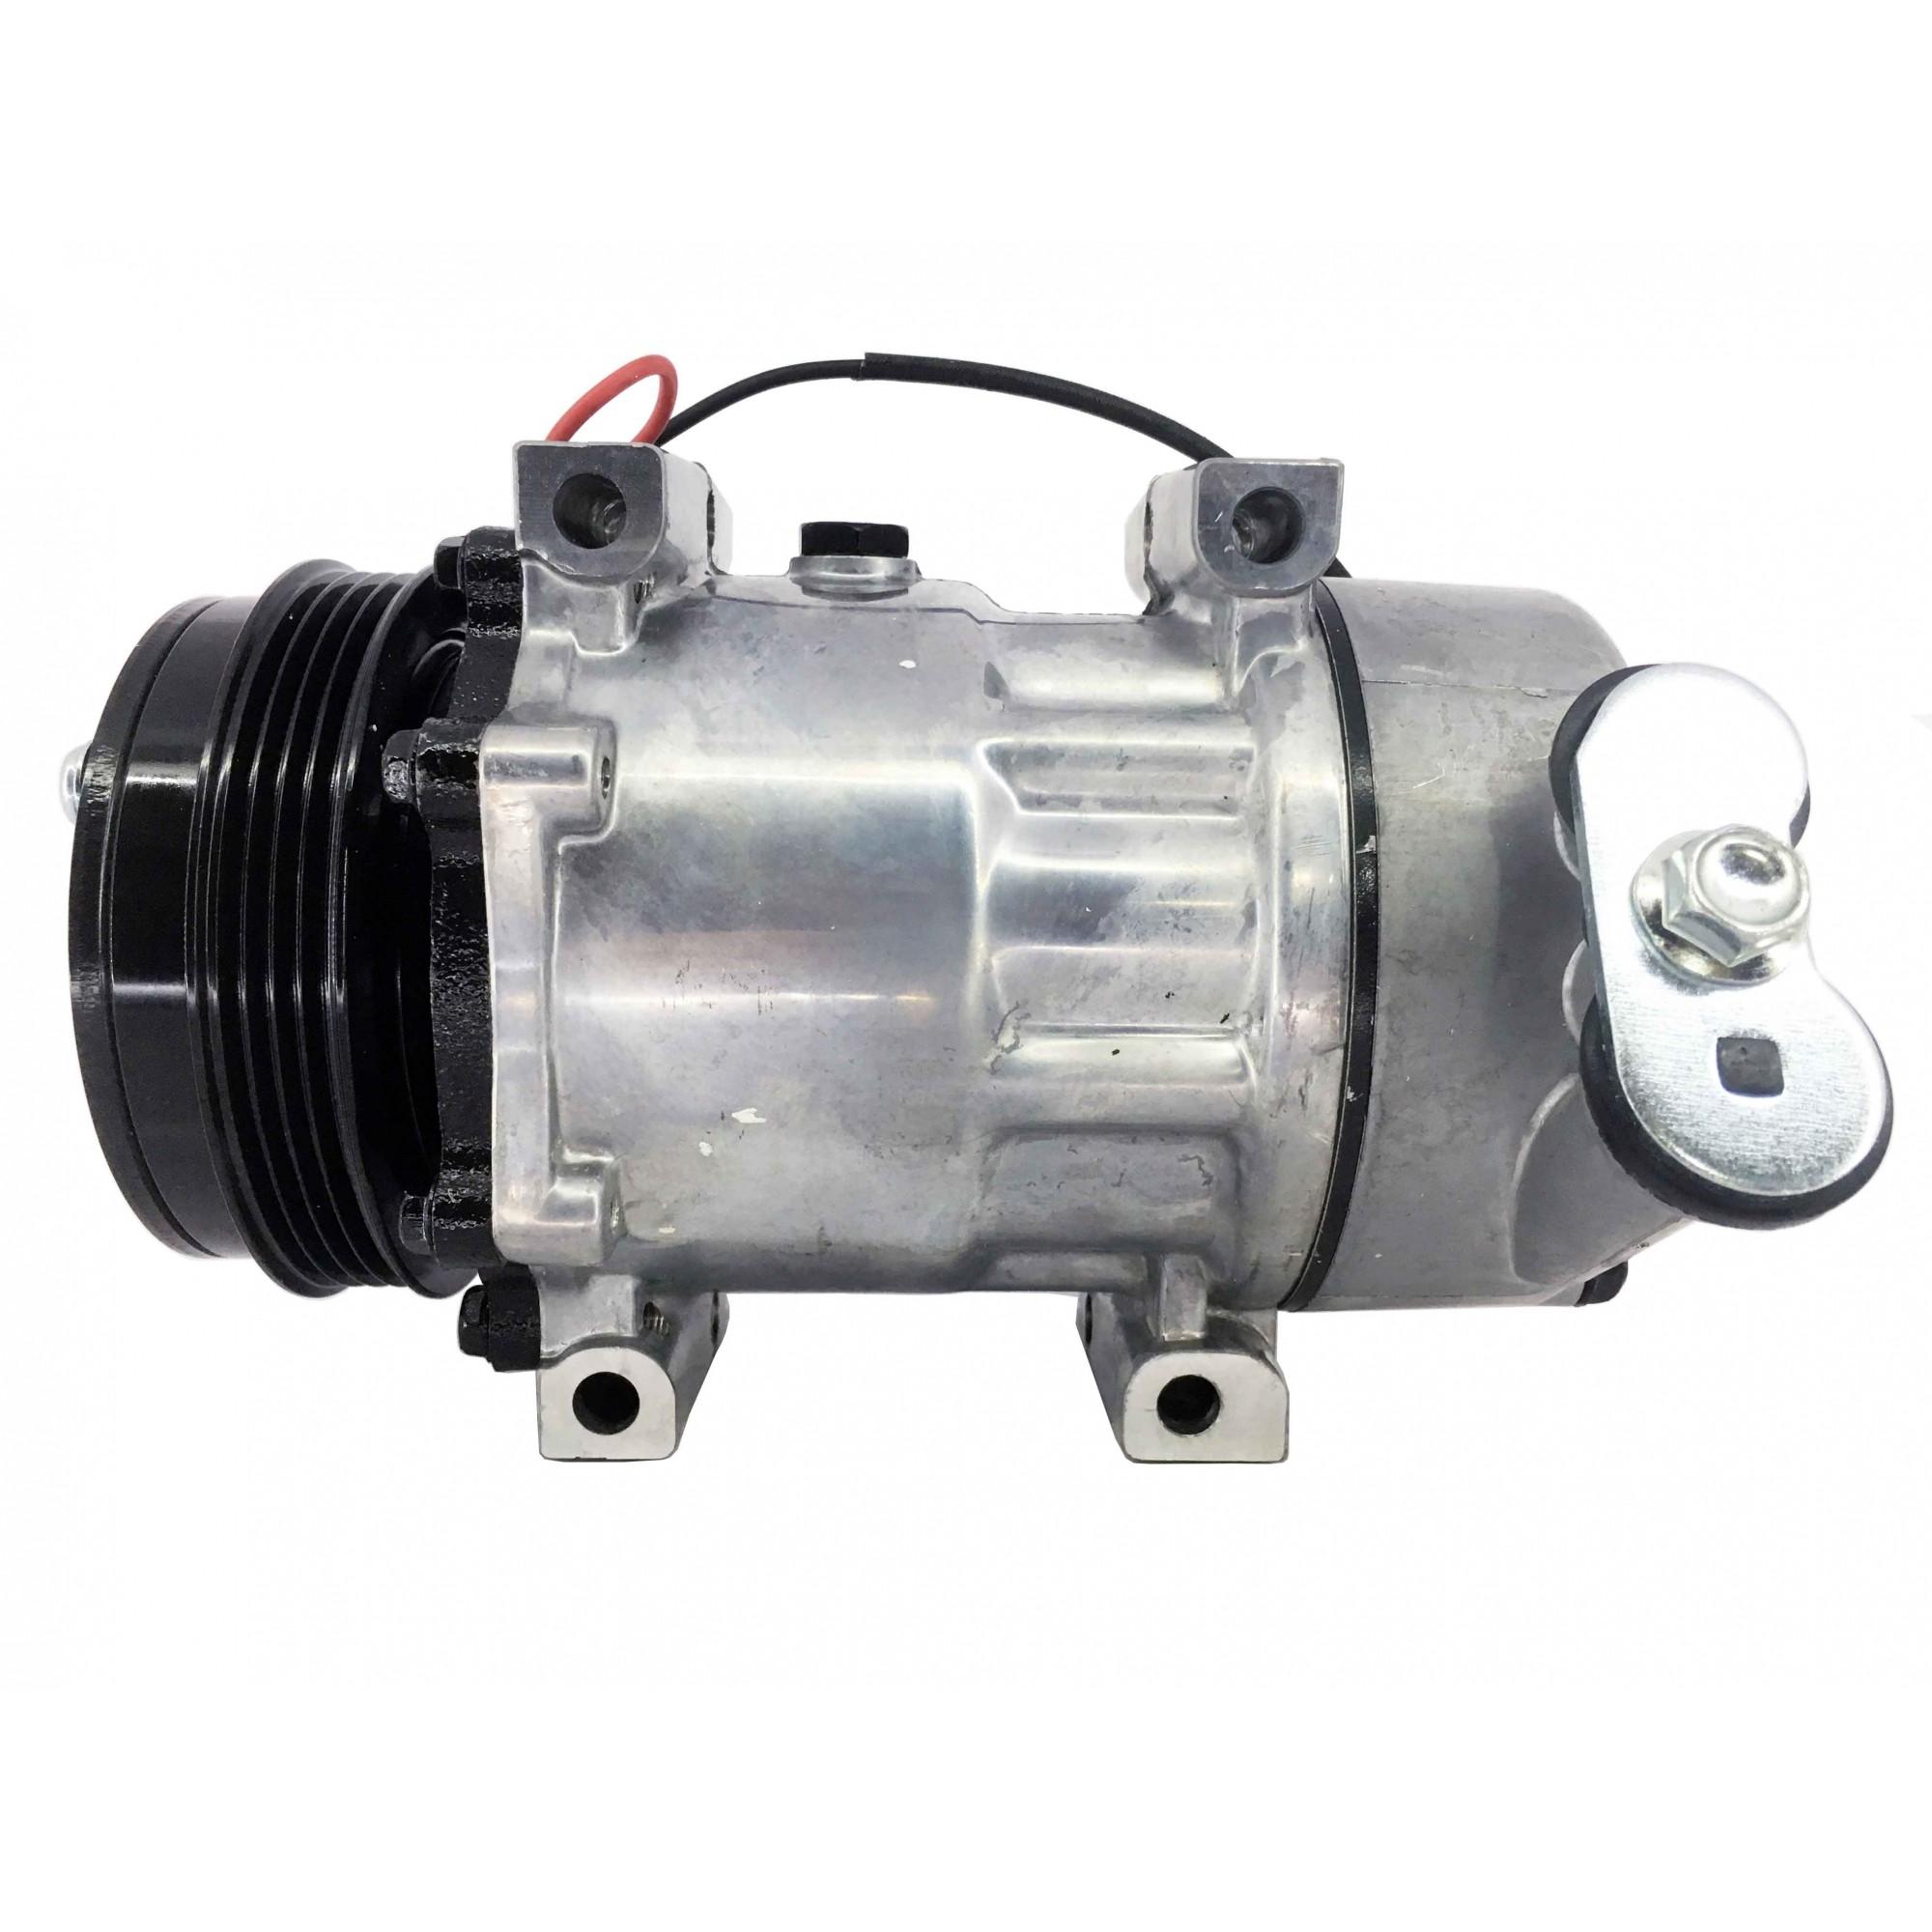 Compressor Ducato / Jumper 2.3 Multijet - Importado